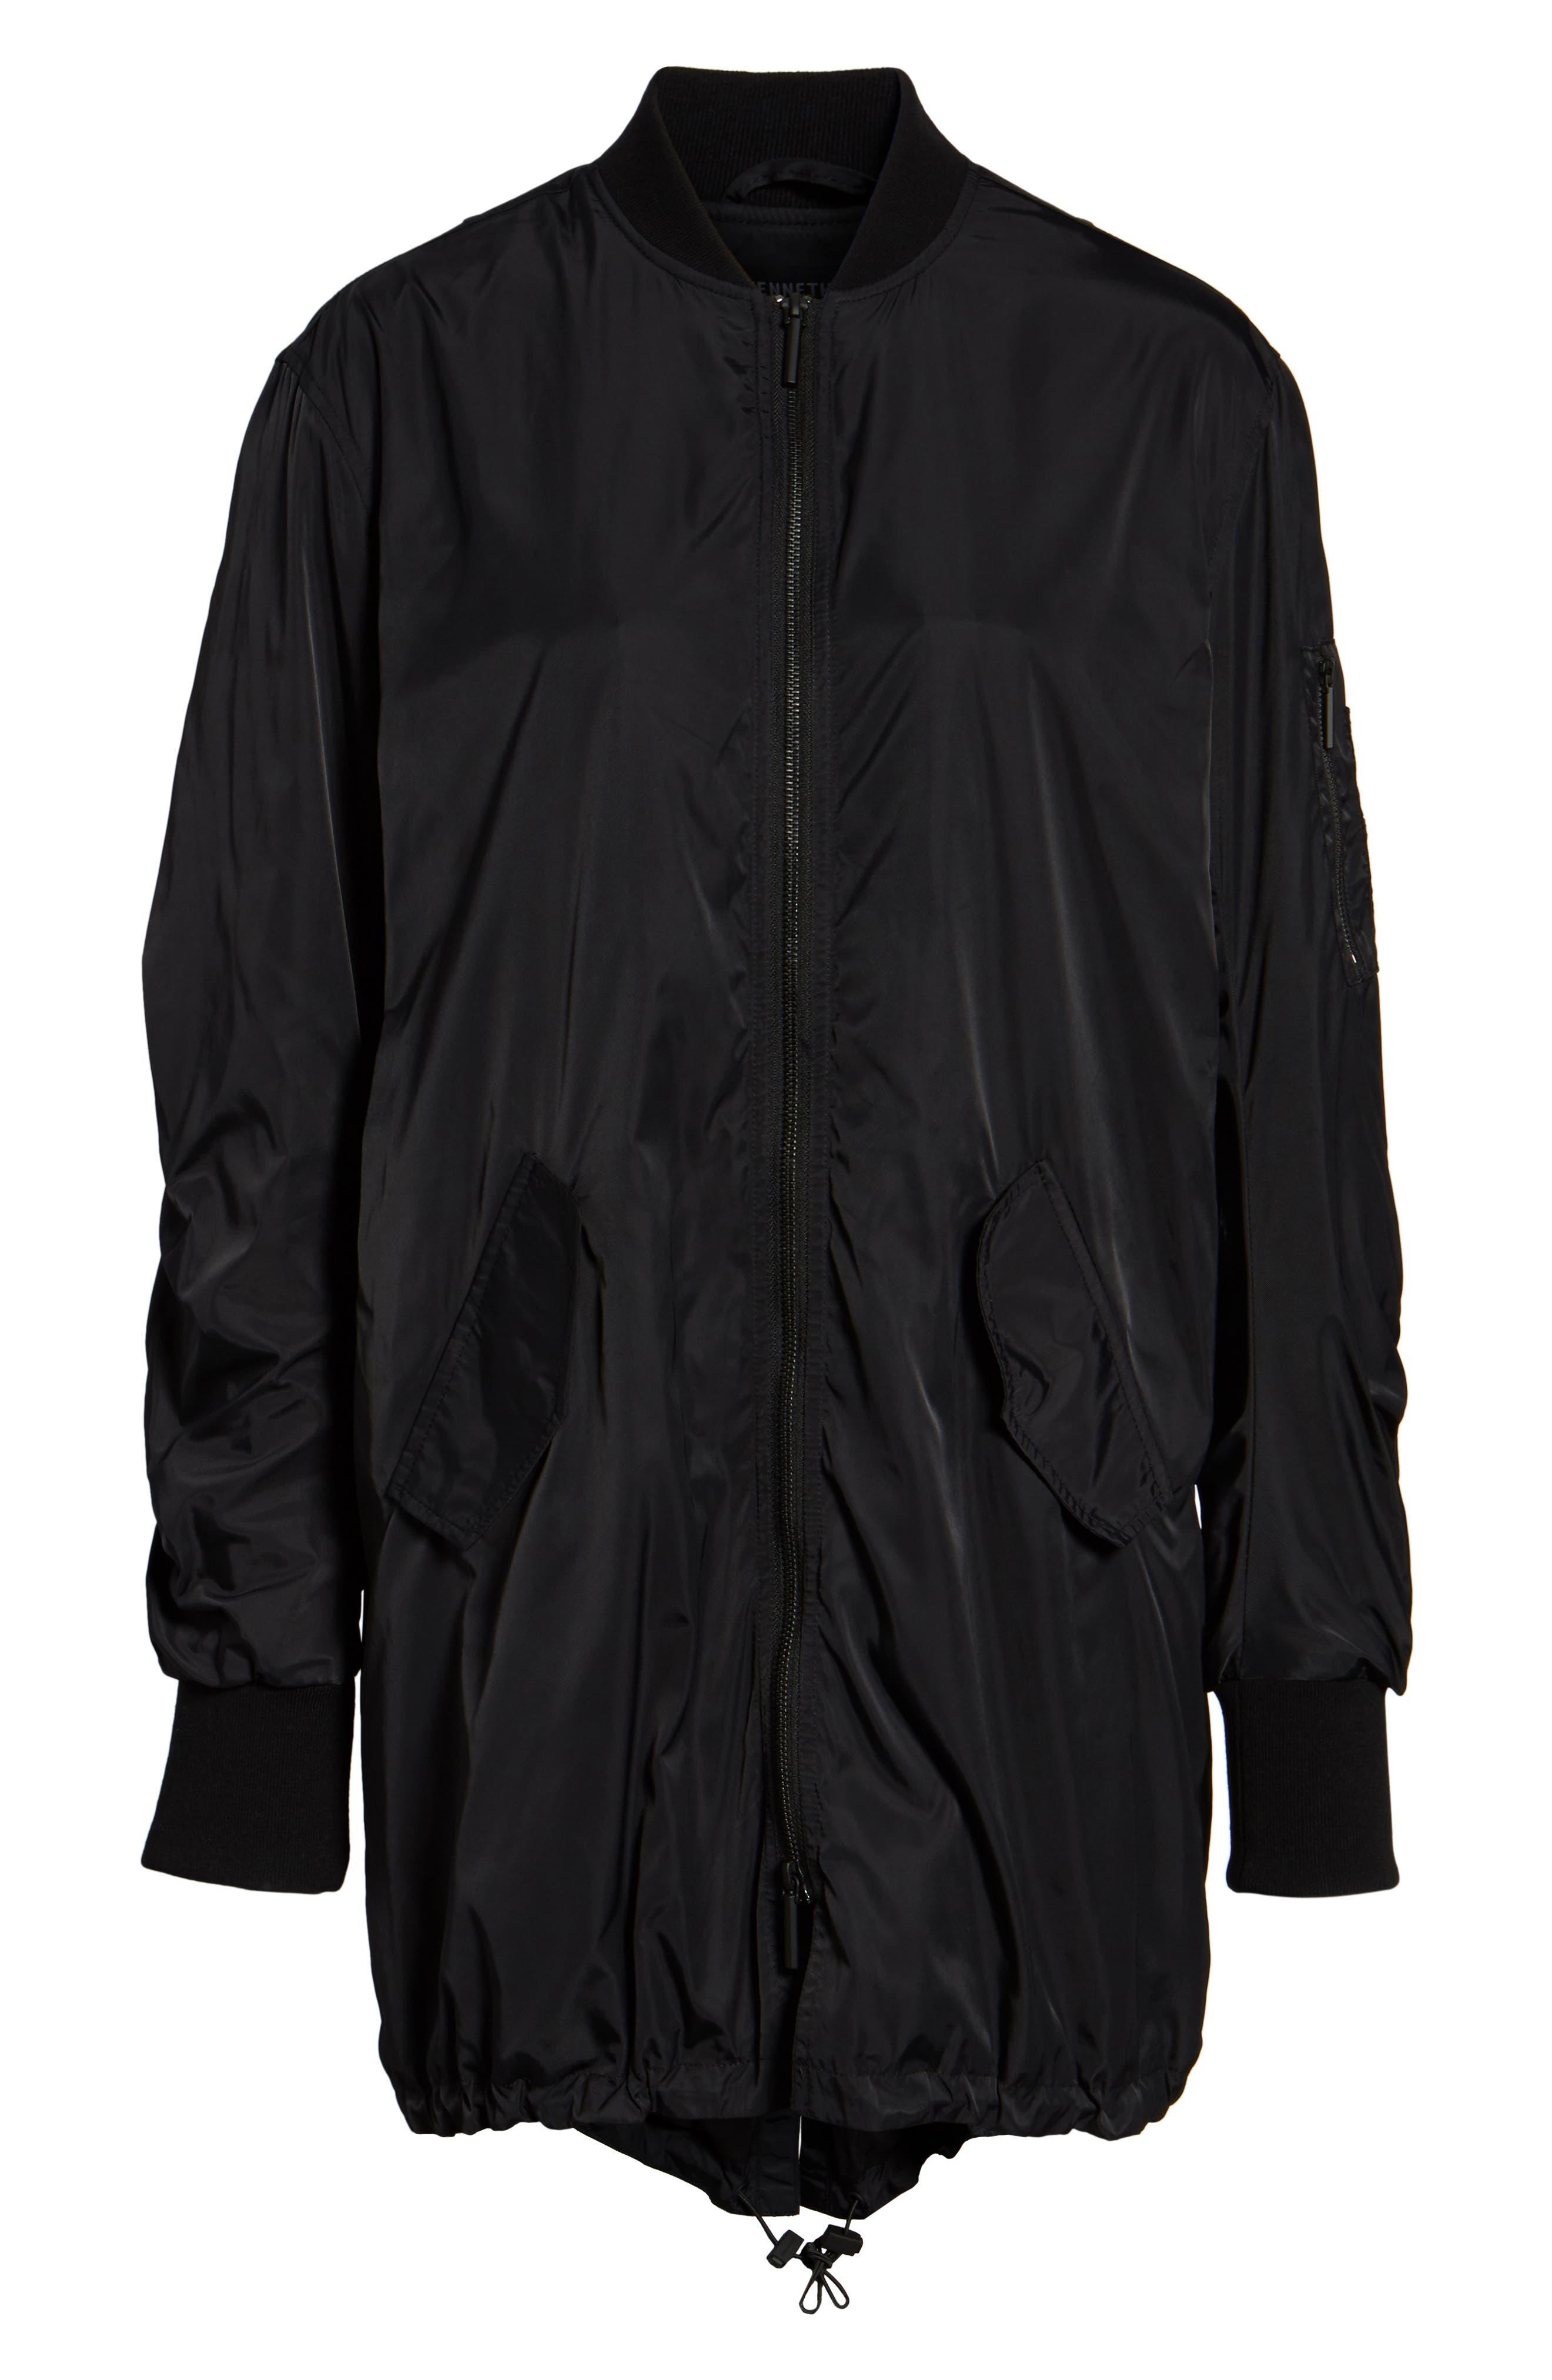 Bomber Anorak Jacket,                             Alternate thumbnail 6, color,                             Black